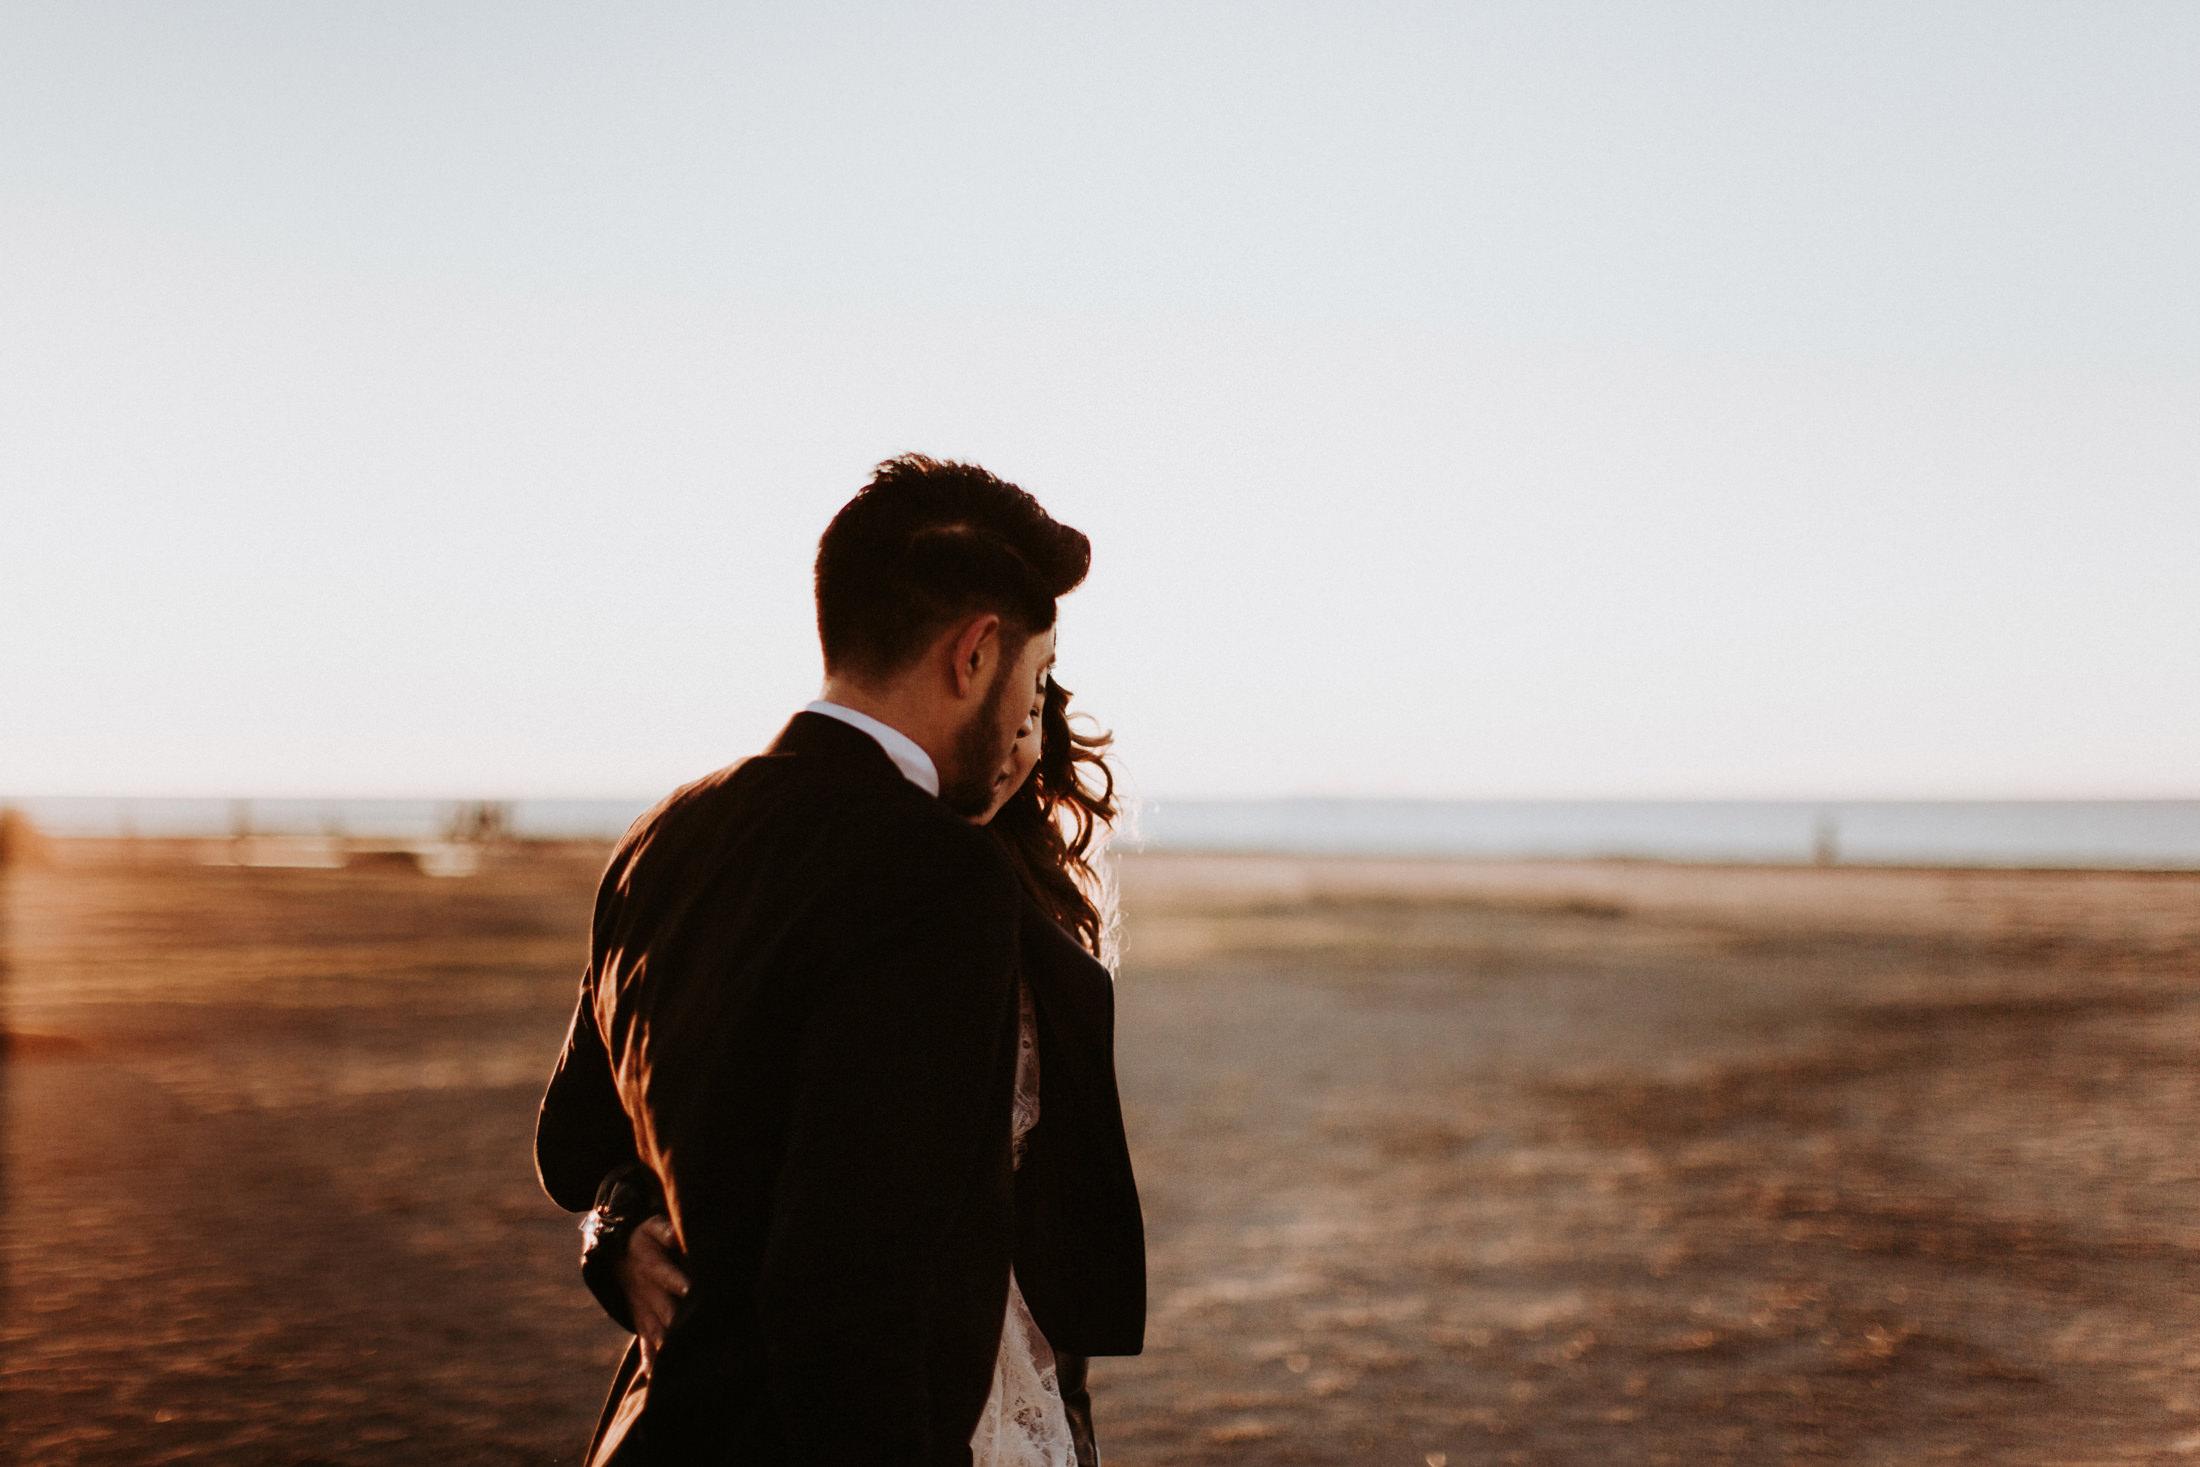 Wedding_Photographer_Mallorca_Daniela-Marquardt_Photography_CanaryIslands_Lanzarote_Iceland_Tuskany_Santorini_Portugal_Schweiz_Austria_Bayern_Elopement_Hochzeitsfotograf_Norddeichich_80